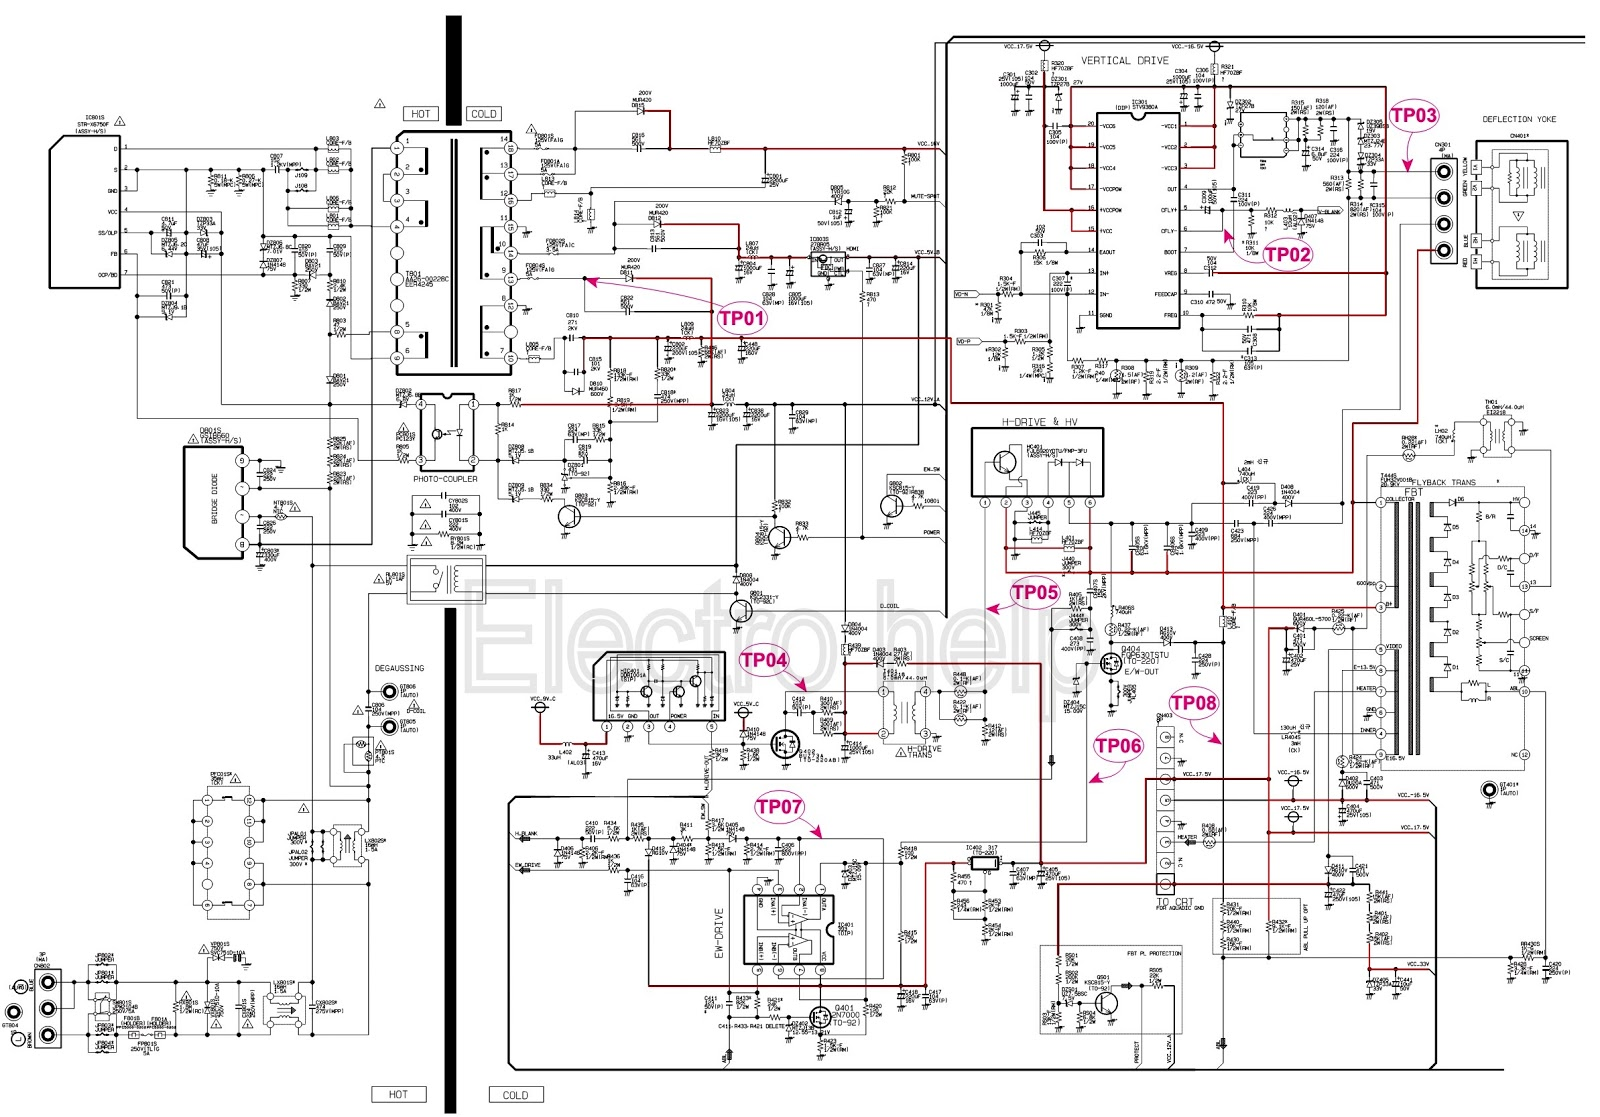 WRG-0704] Schematic Circuit Diagram Str